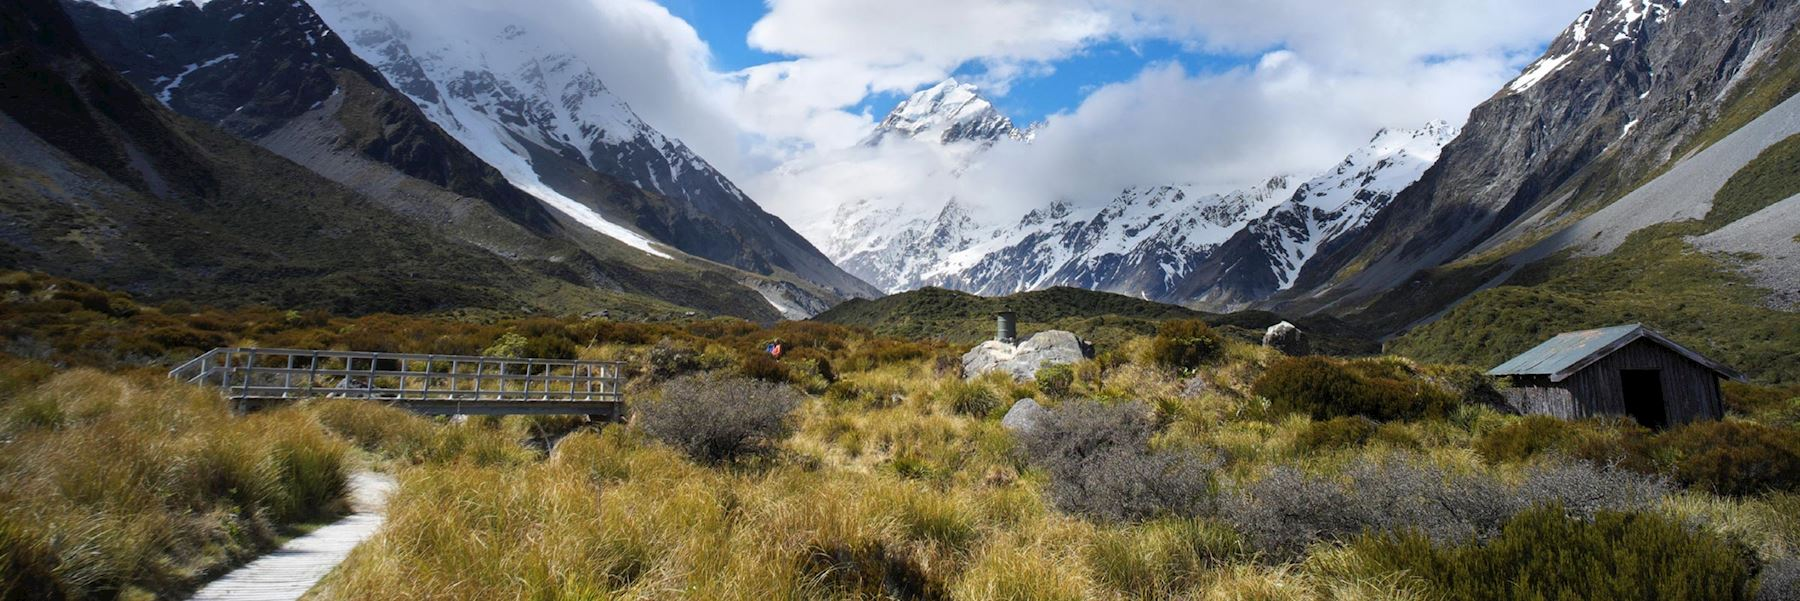 Visit Mount Cook National Park, New Zealand